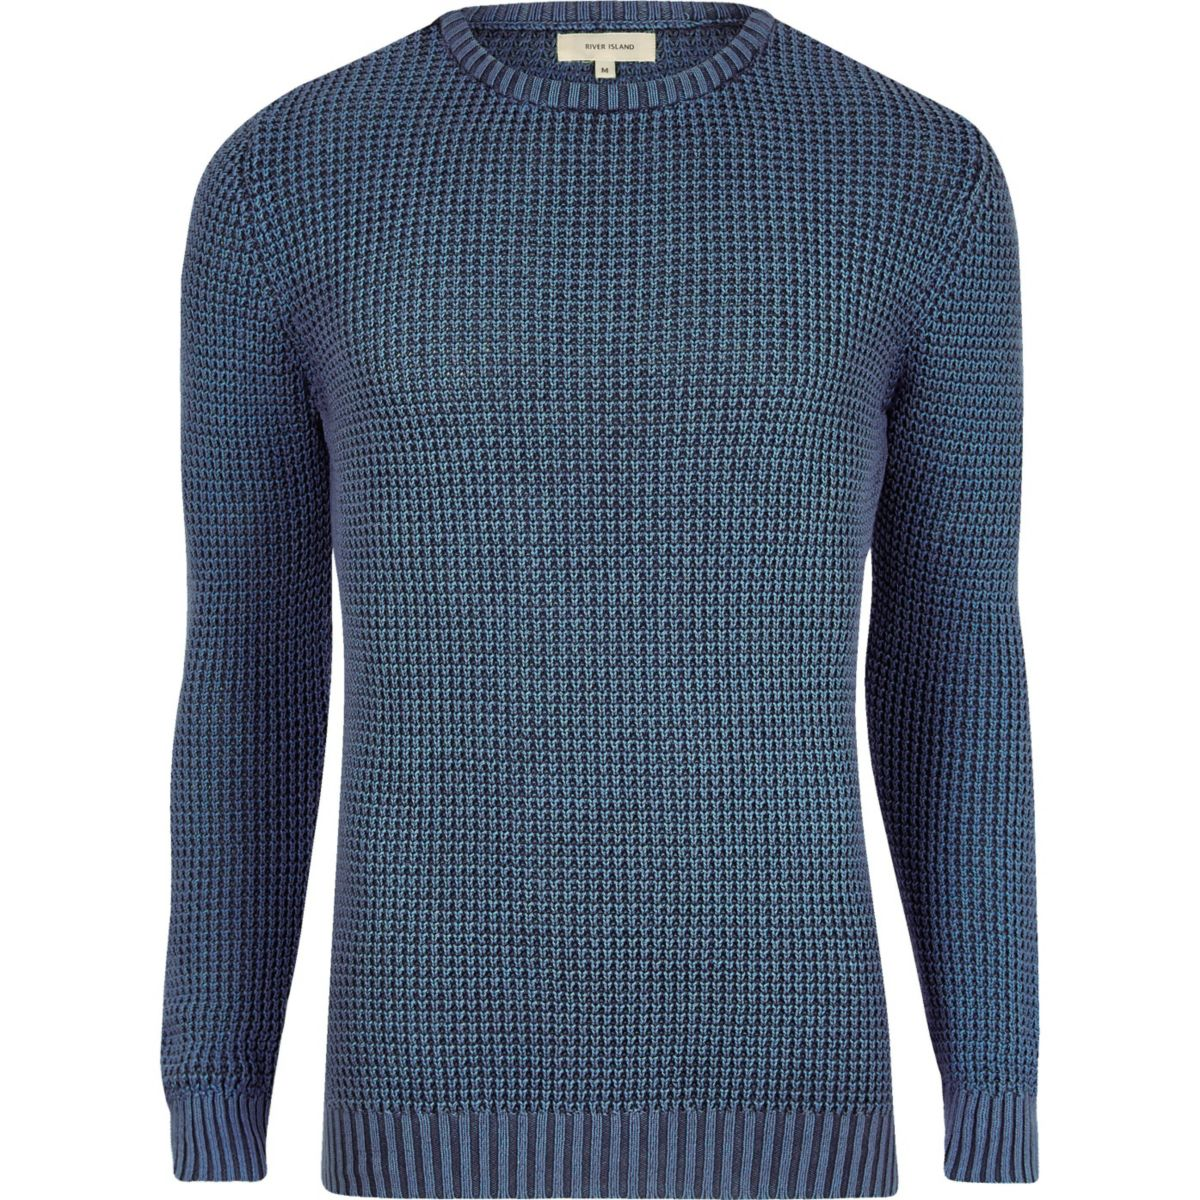 Blue acid wash slim fit knit sweater